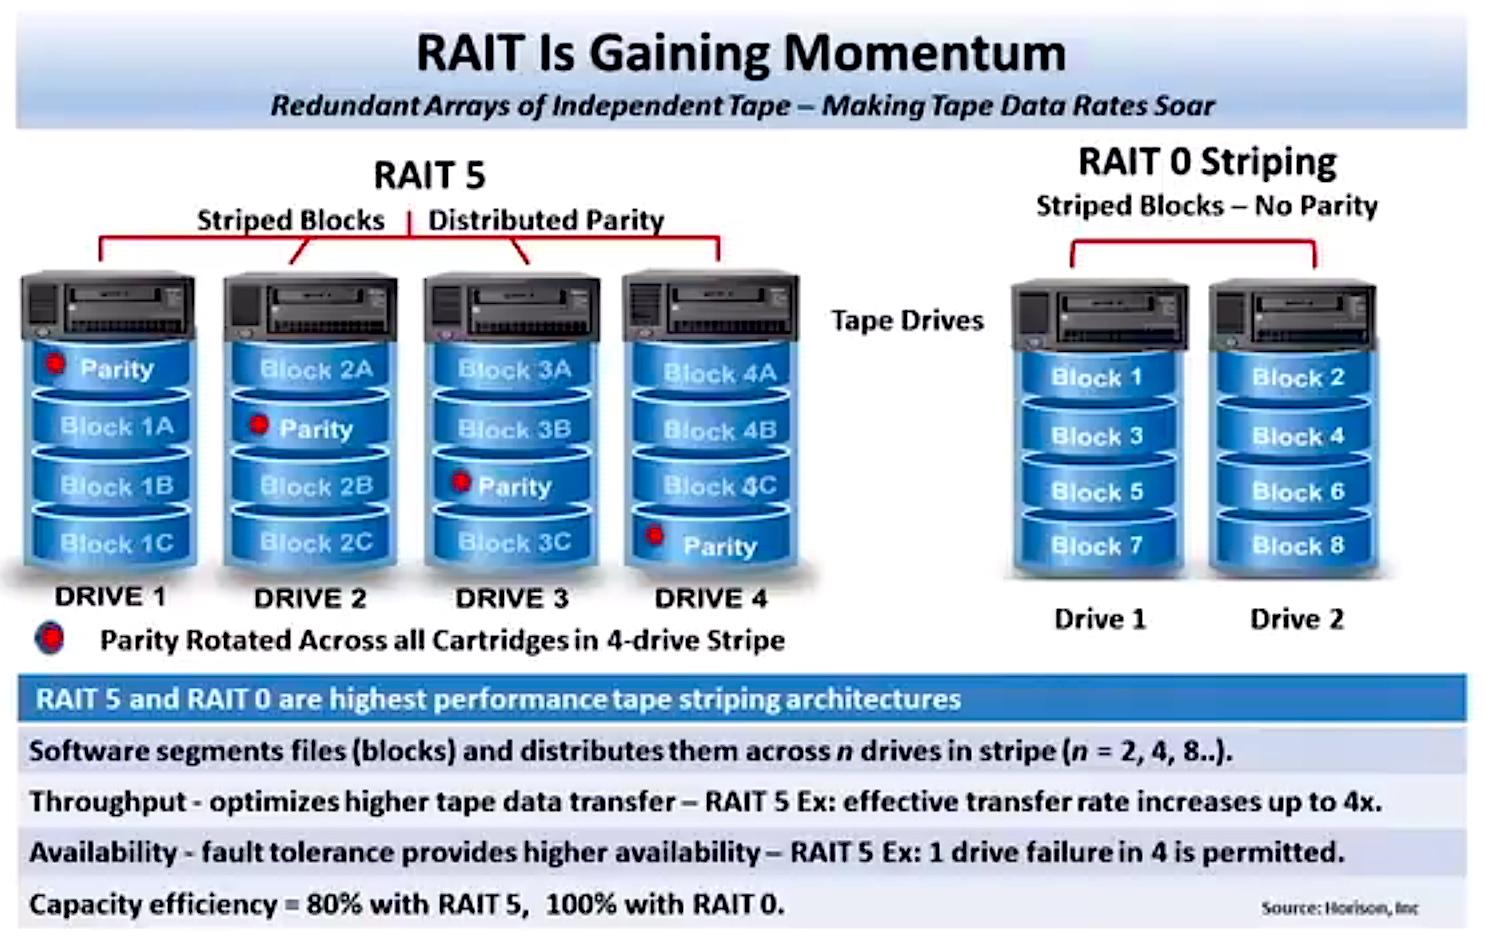 RAIT – Rapid Transit for Mass Storage